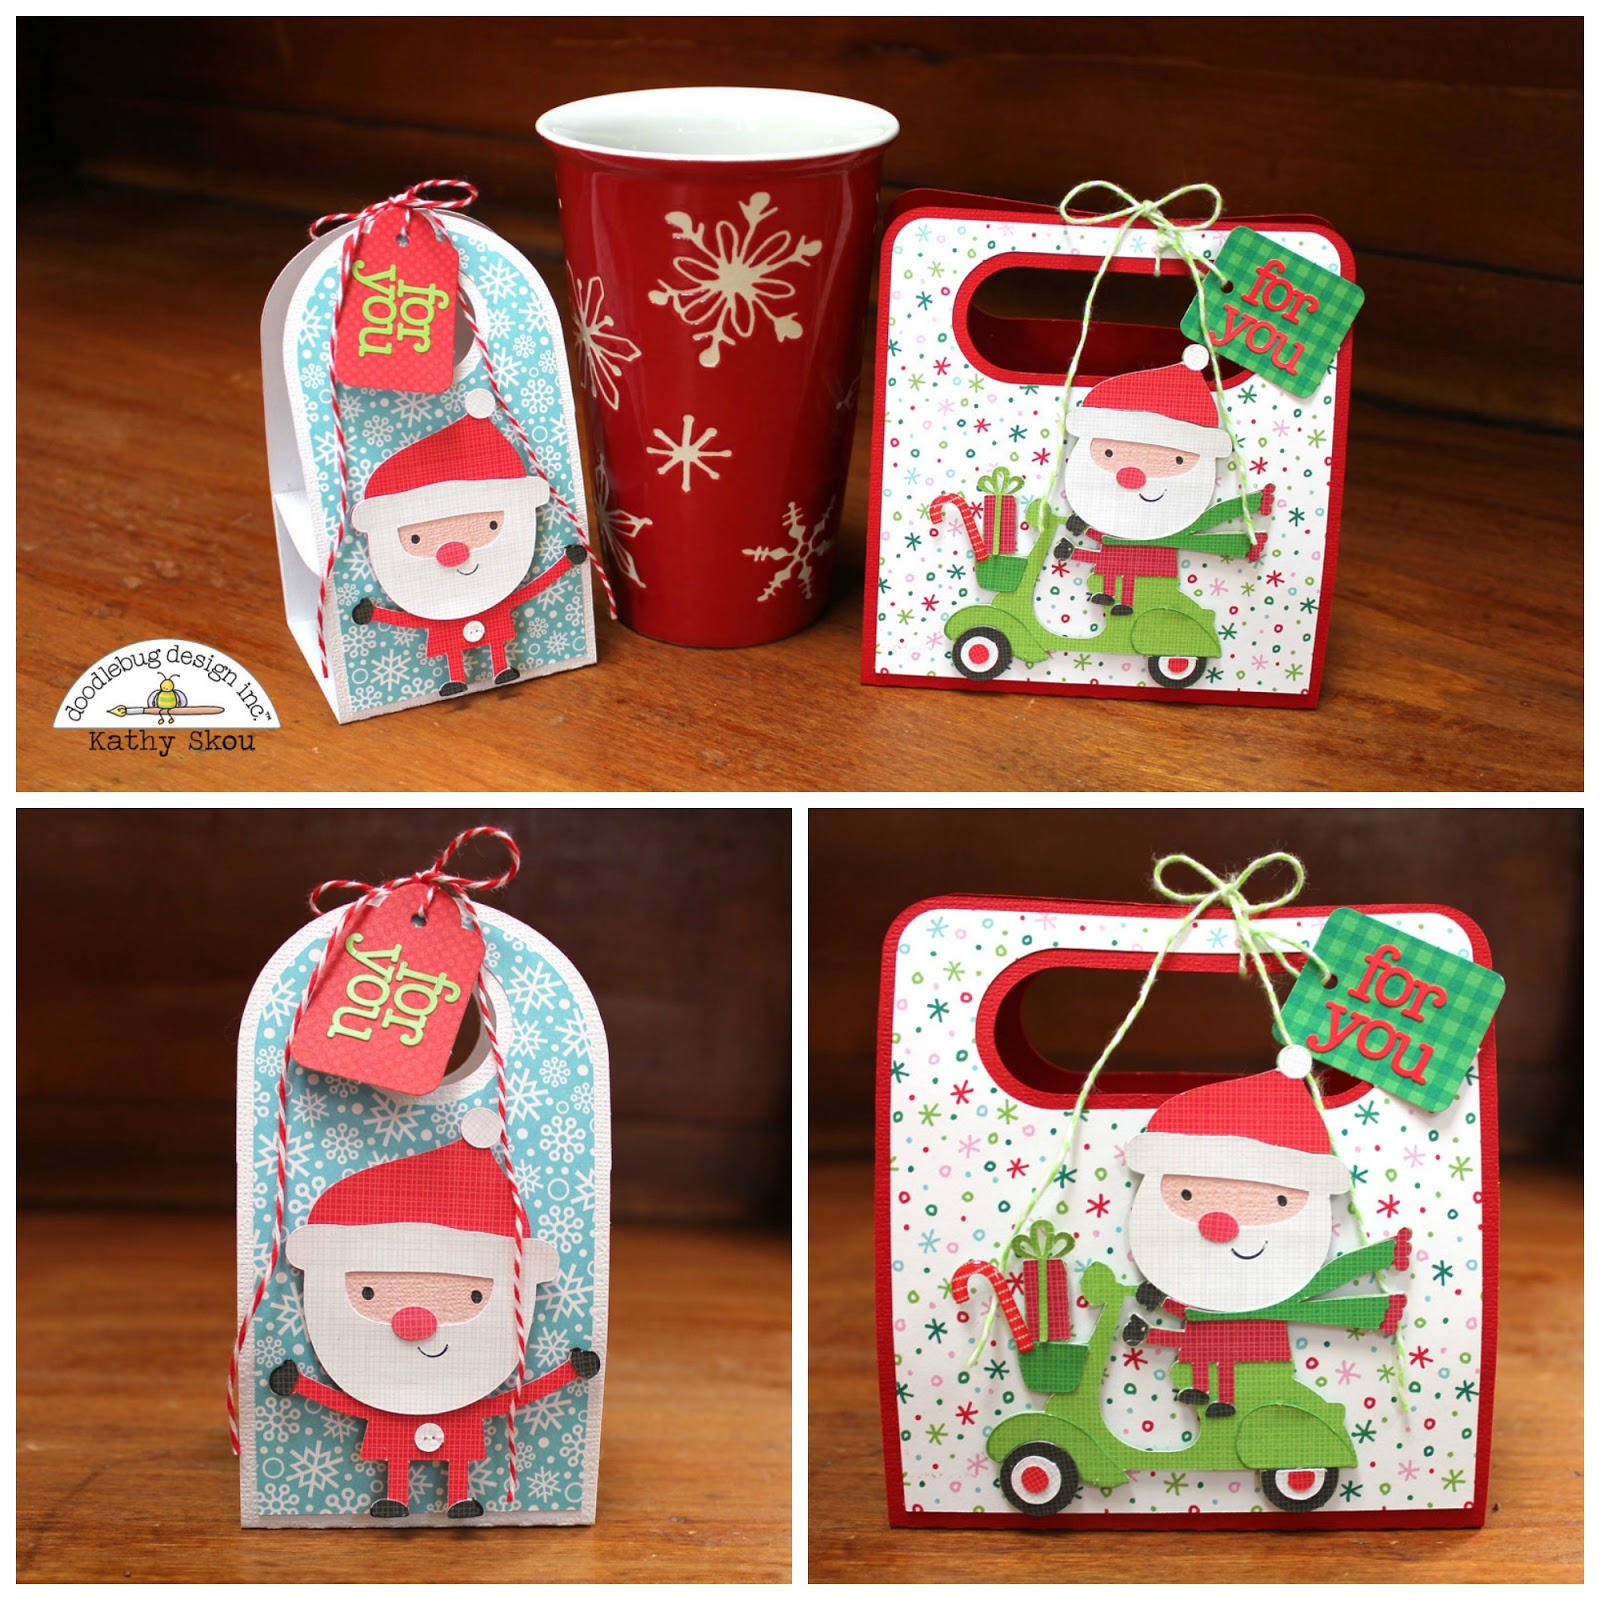 doodlebug design inc blog here comes santa claus cut files with kathy